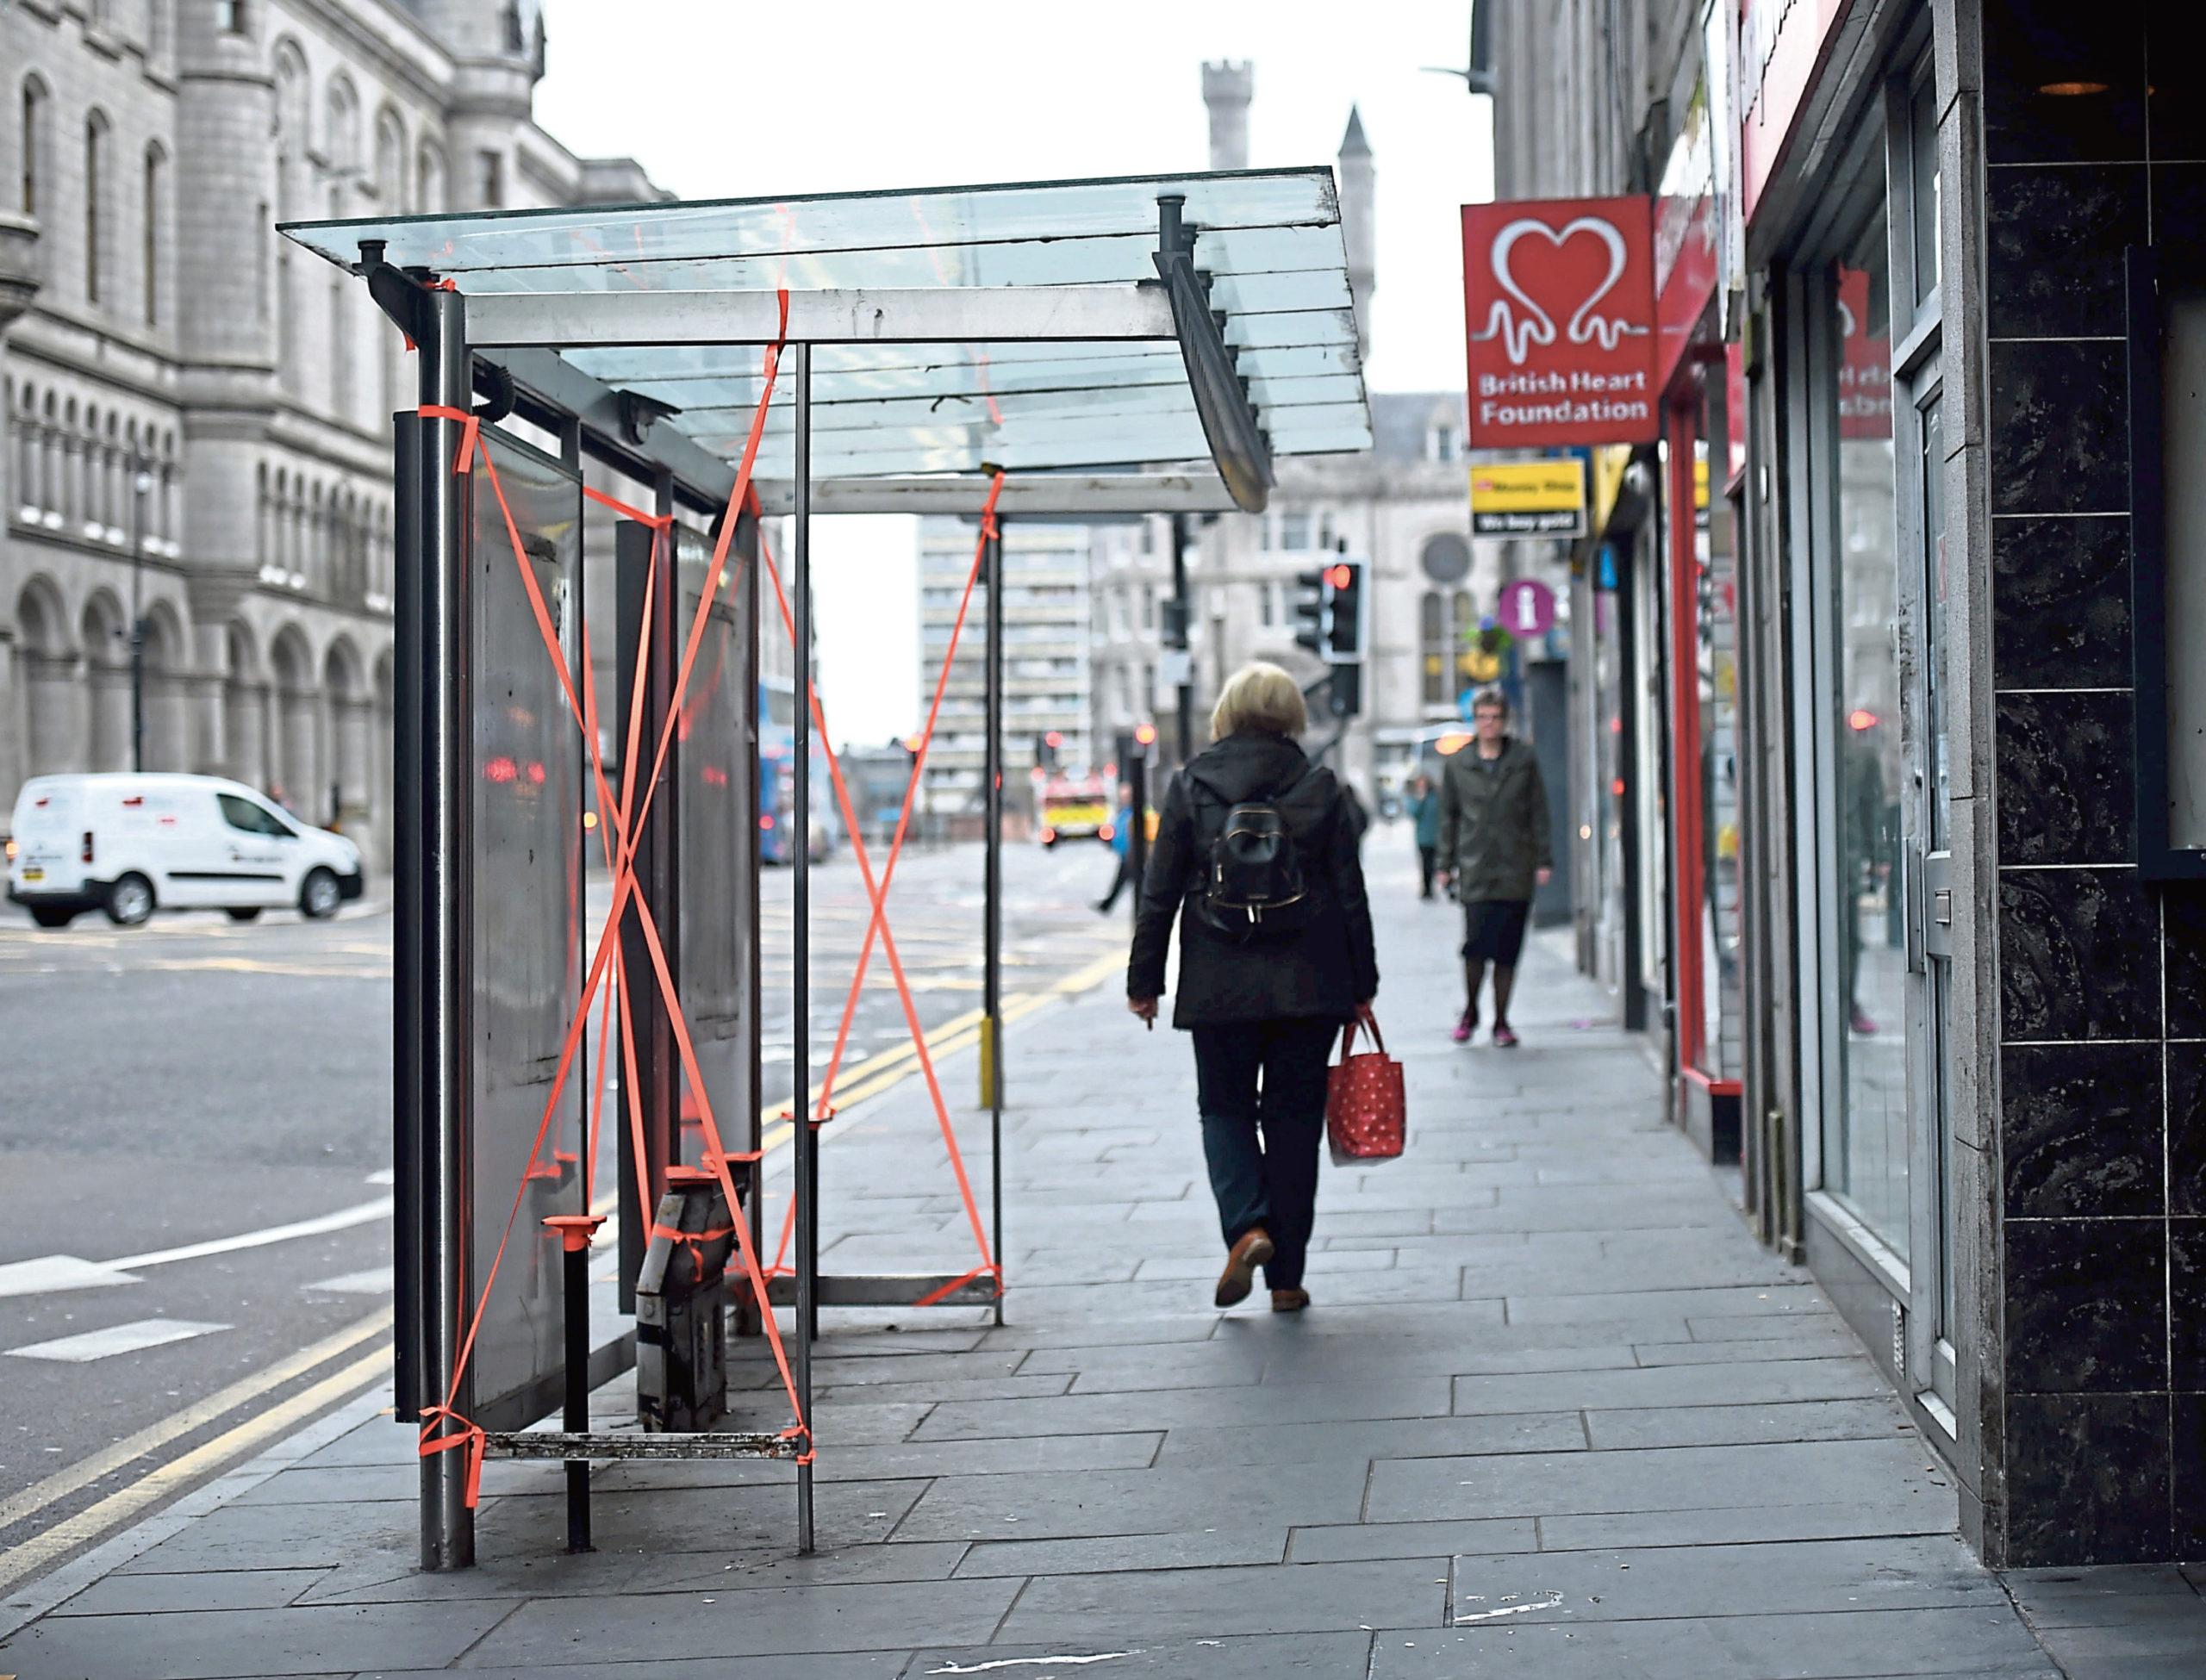 A damaged bus shelter on Union Street